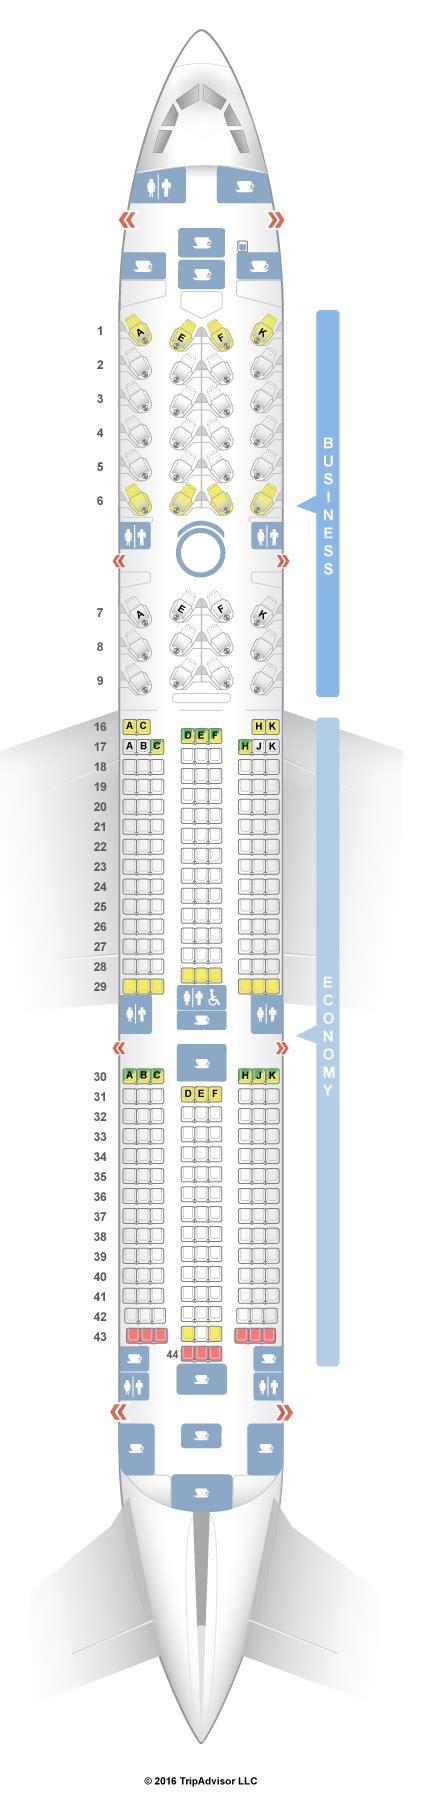 ba a321 seat map seatguru seat map qatar airways airbus a350 350